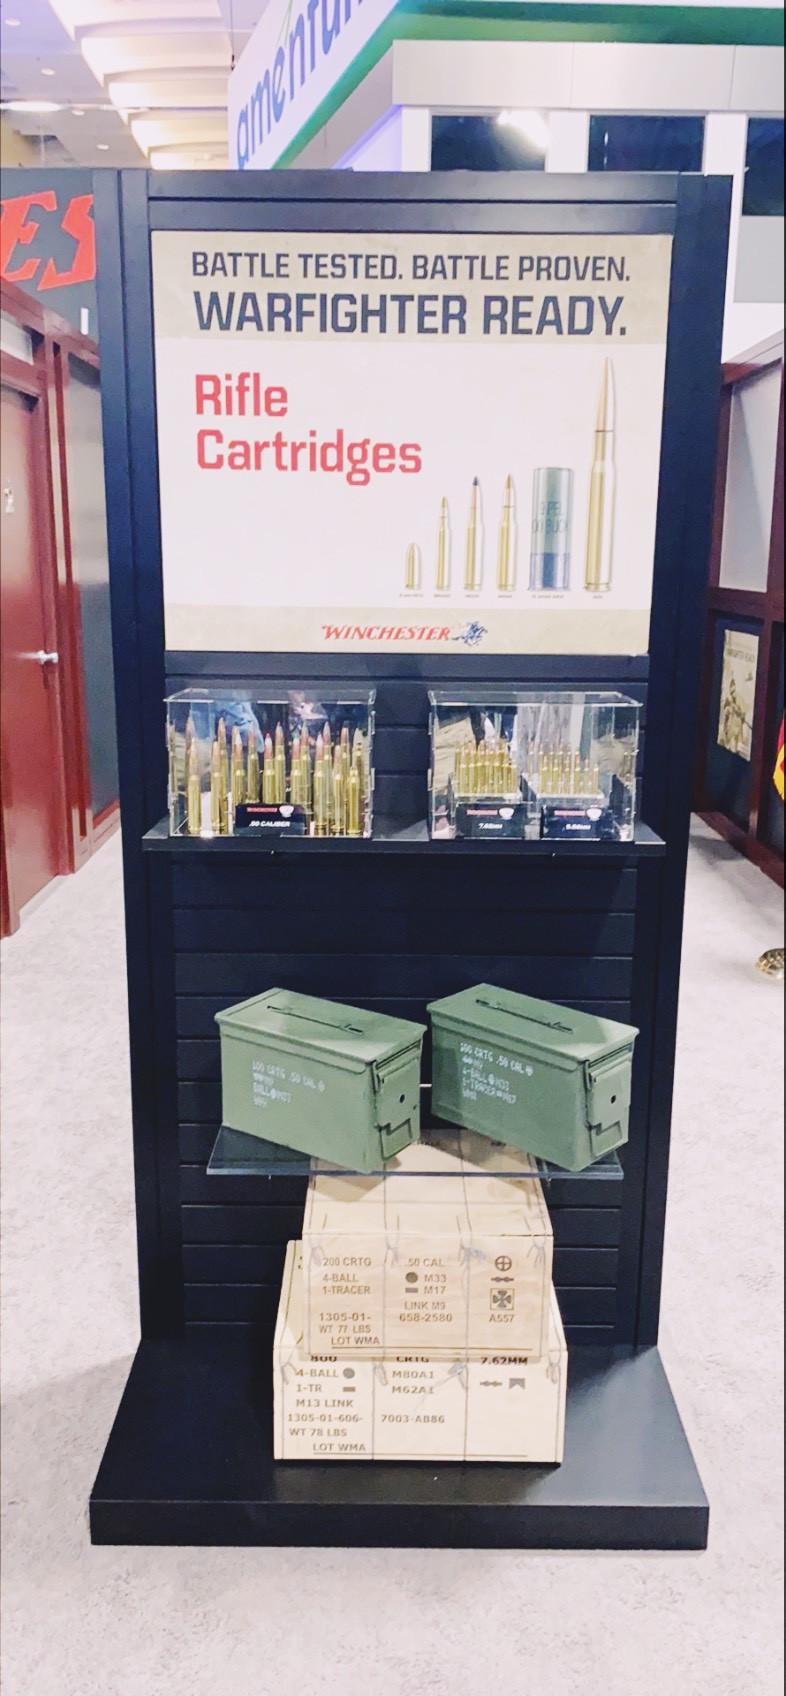 AUSA 2021 12 October 2021 Riffle cartridges